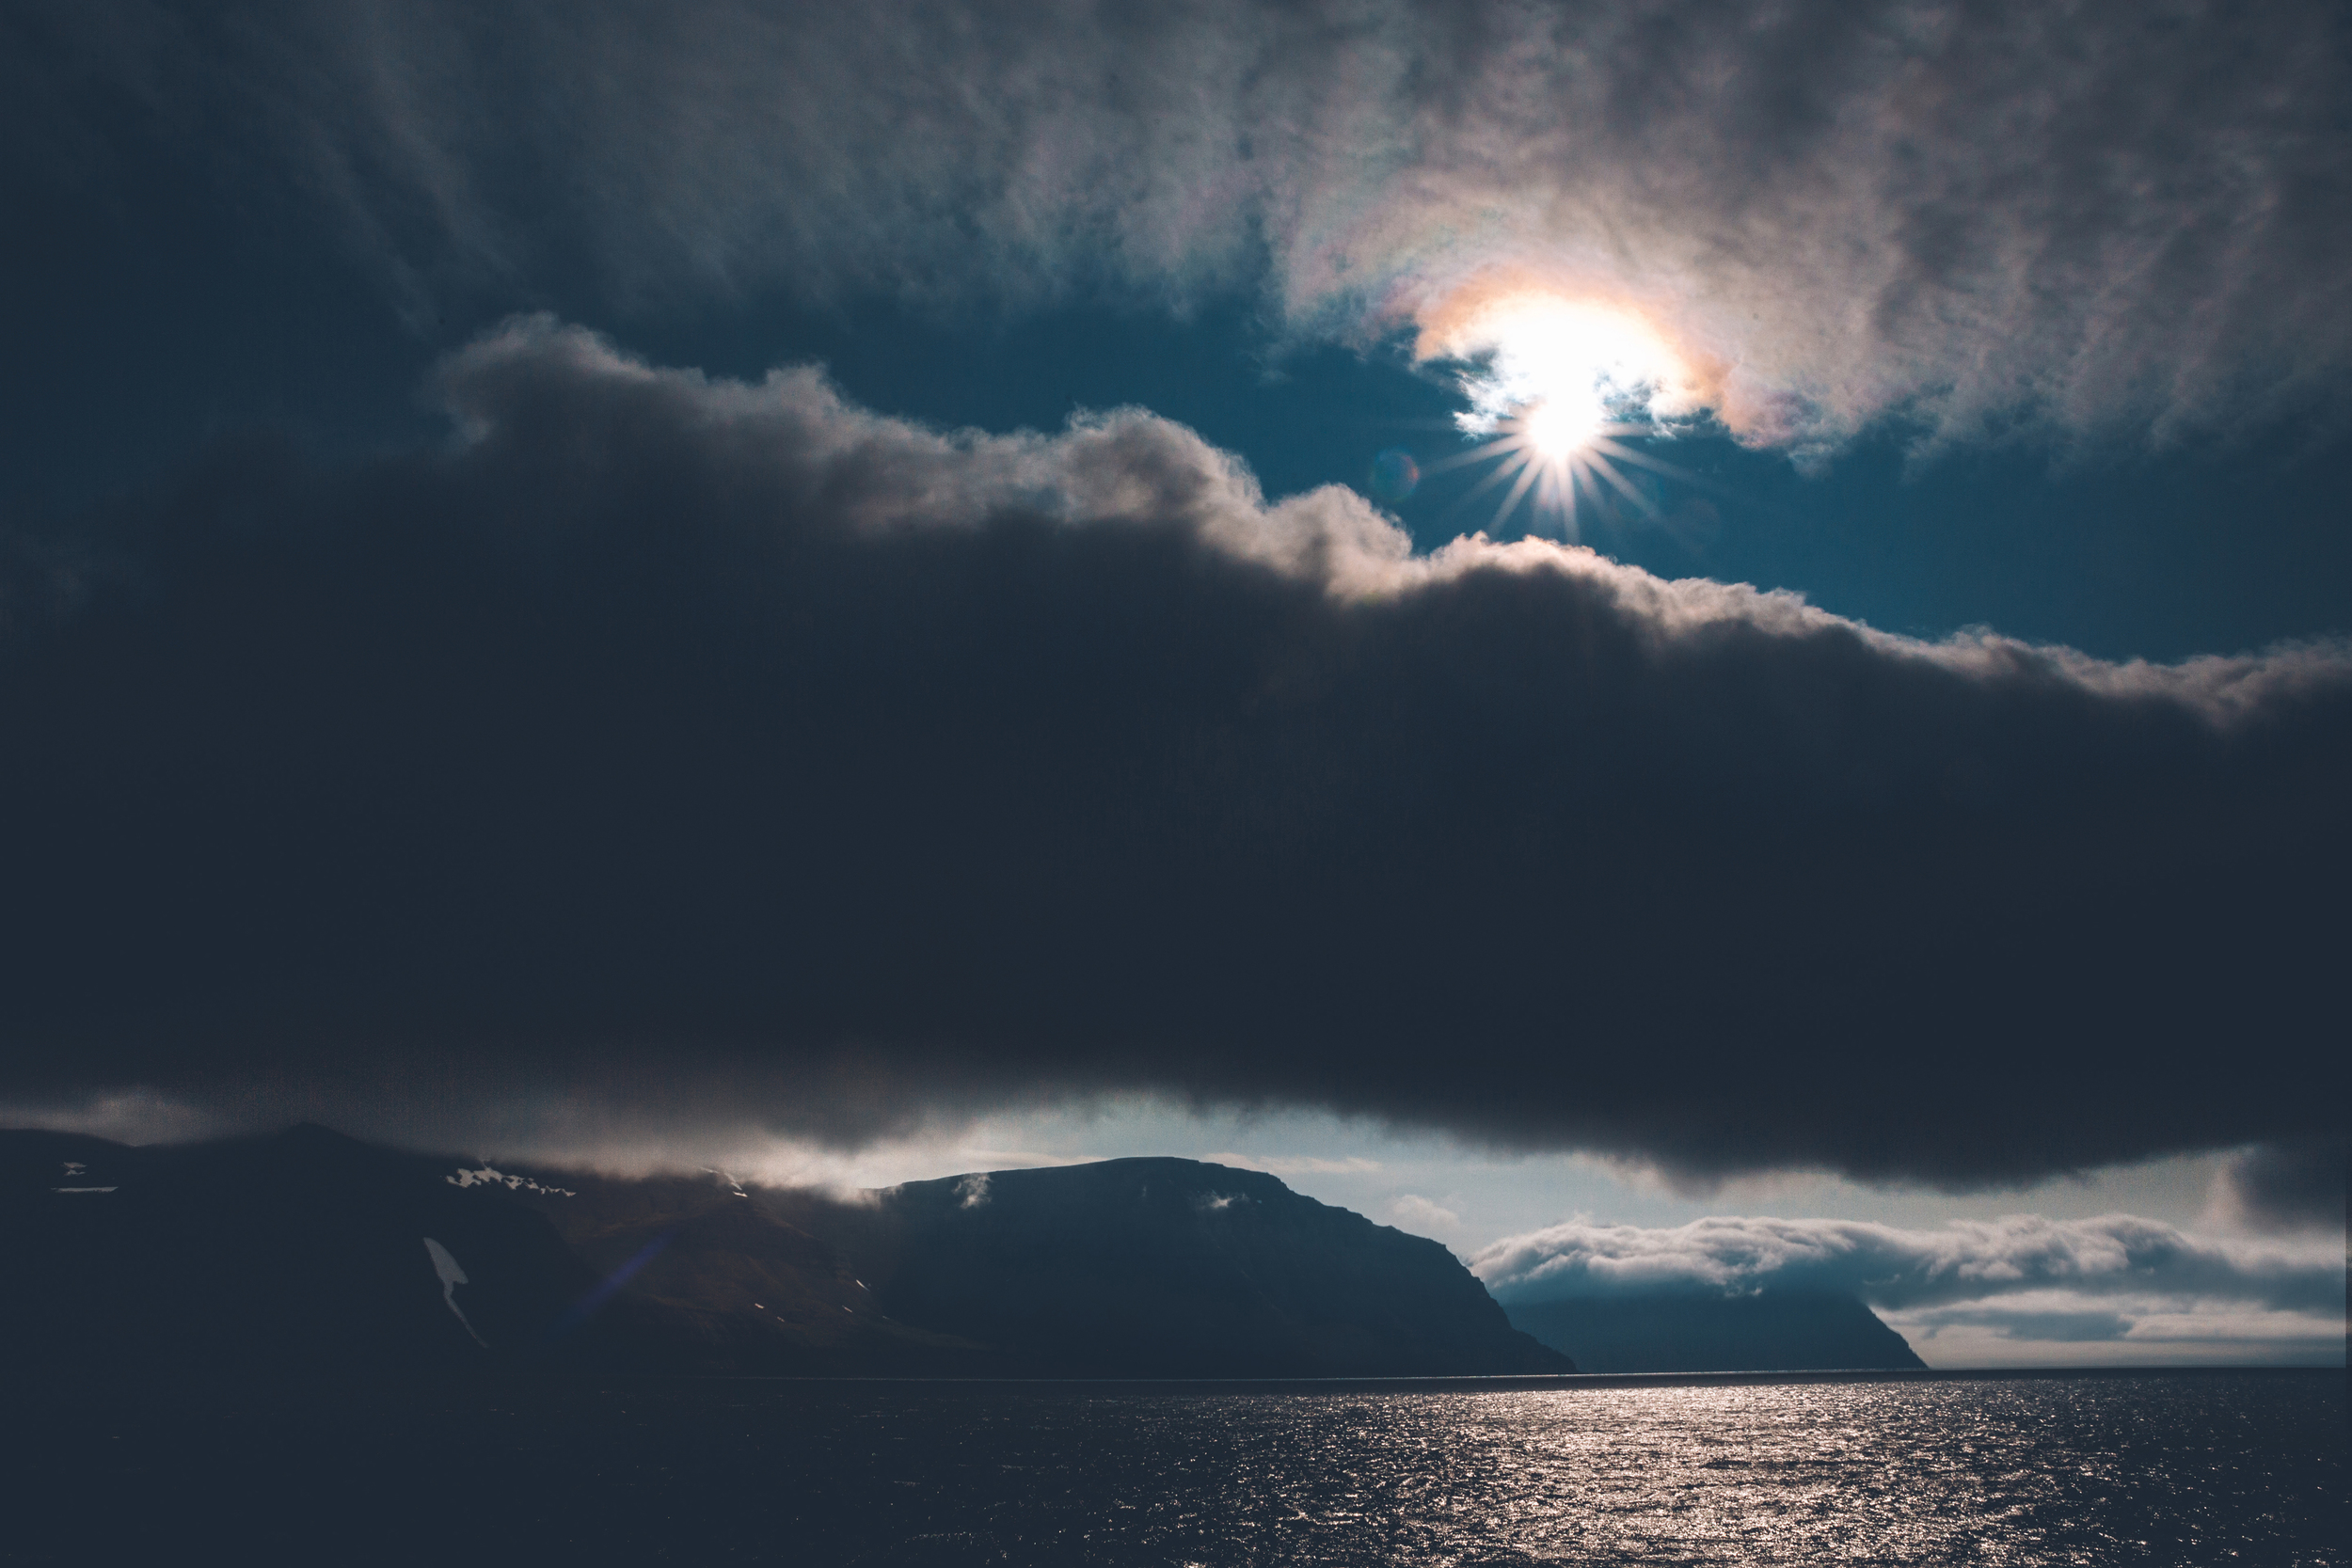 hornstrandir view from boat.jpg